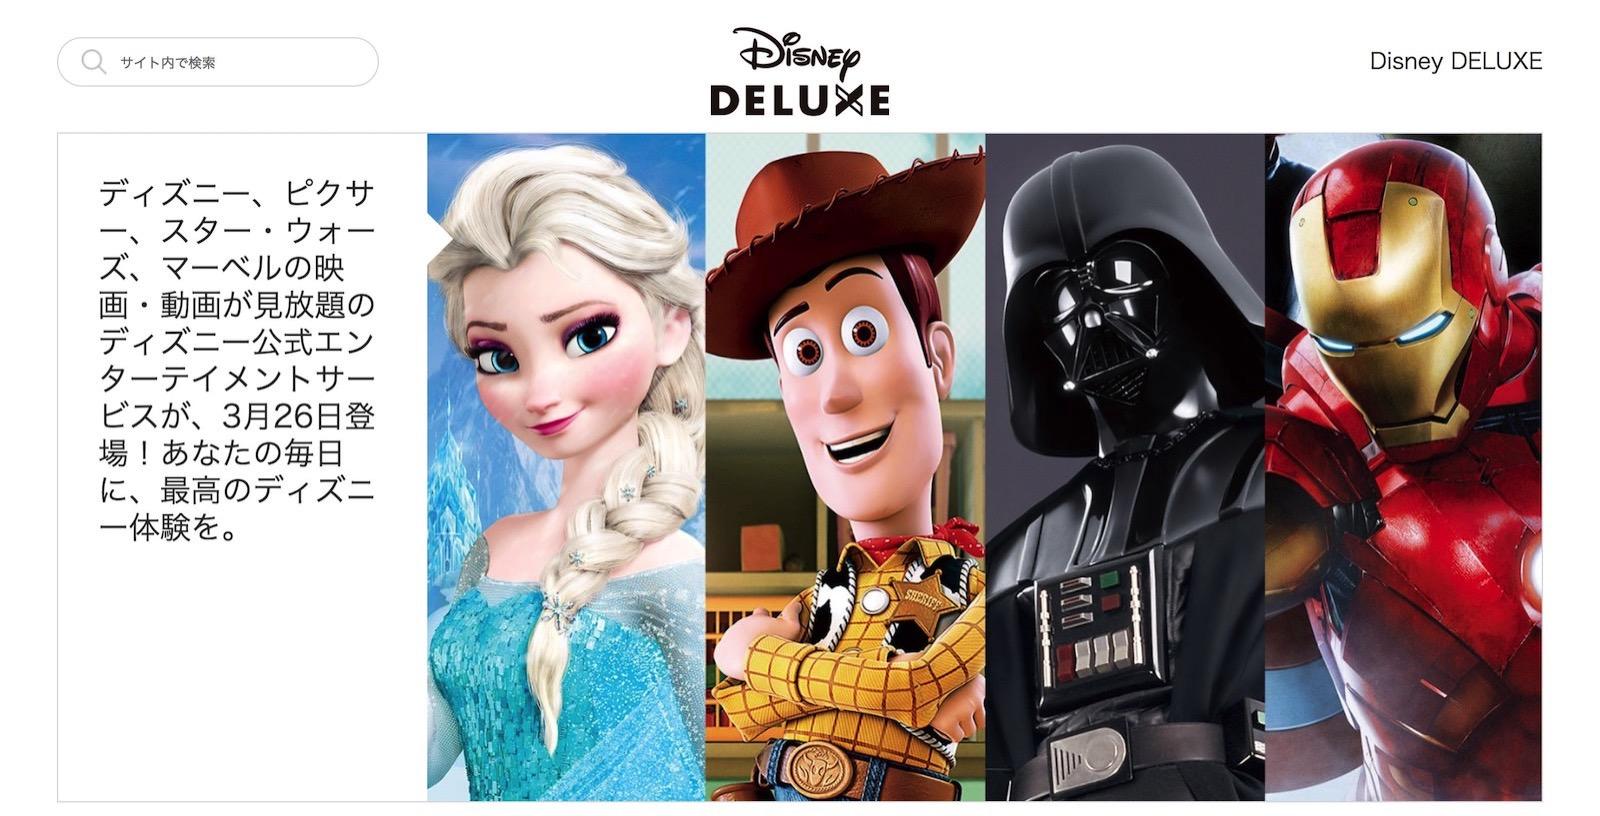 Disney Deluxe docomo